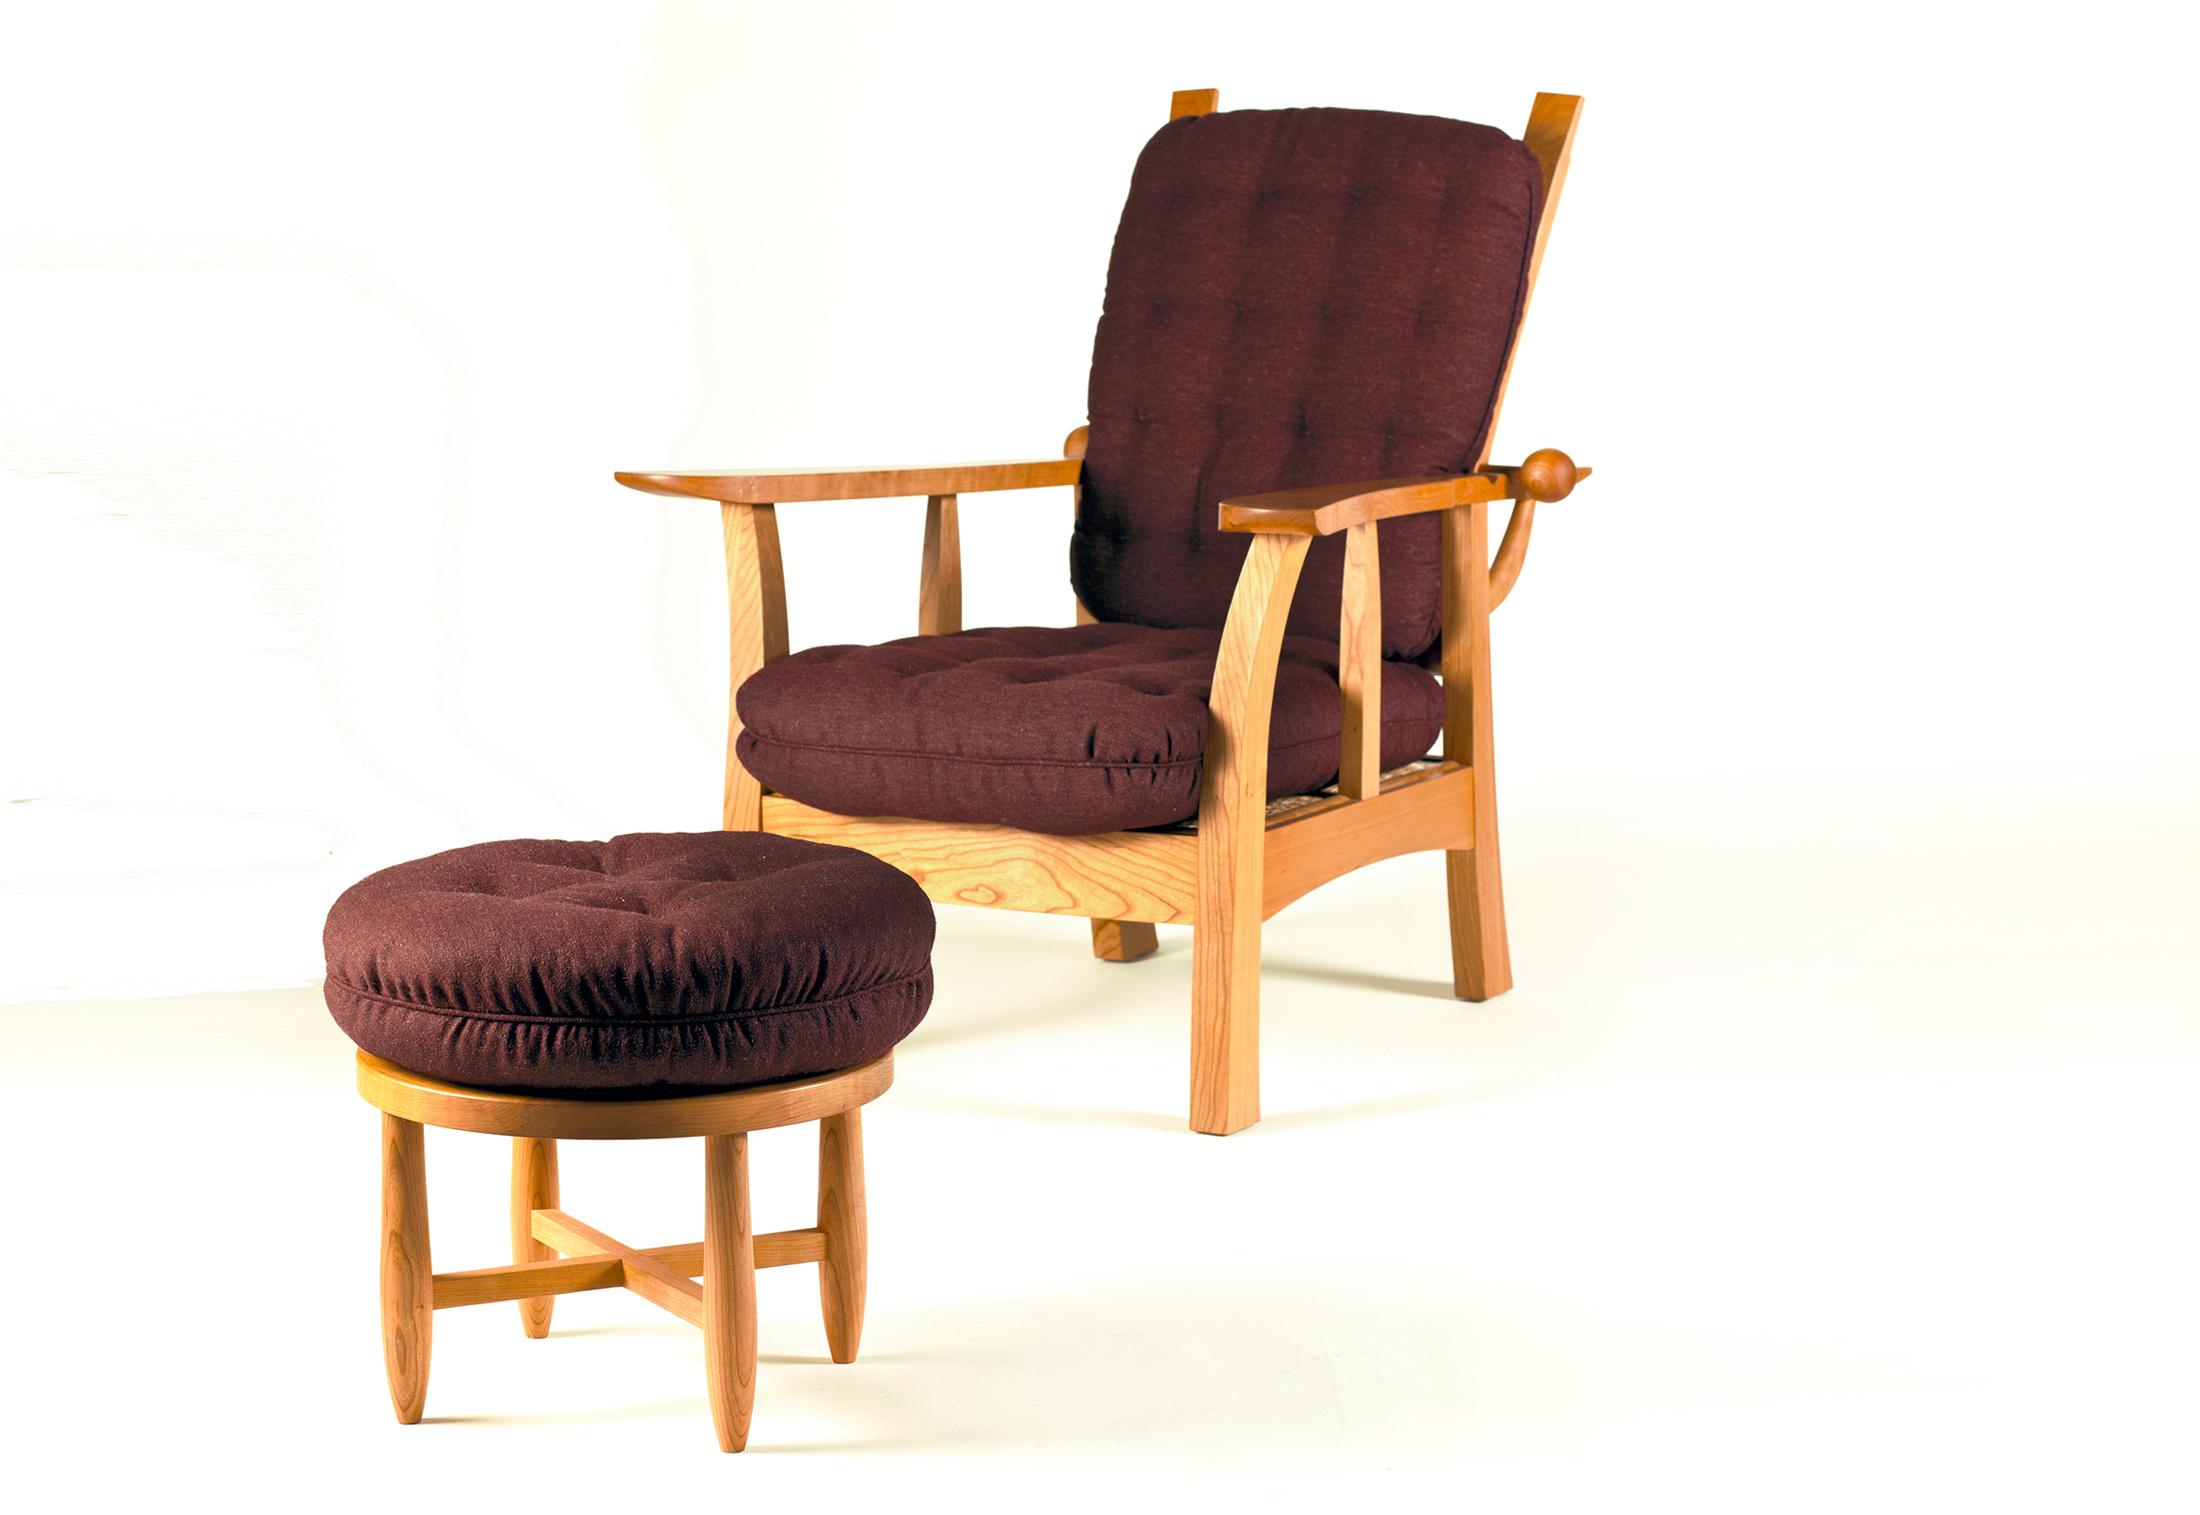 kanadier sessel von wohnkultur 66 stylepark. Black Bedroom Furniture Sets. Home Design Ideas